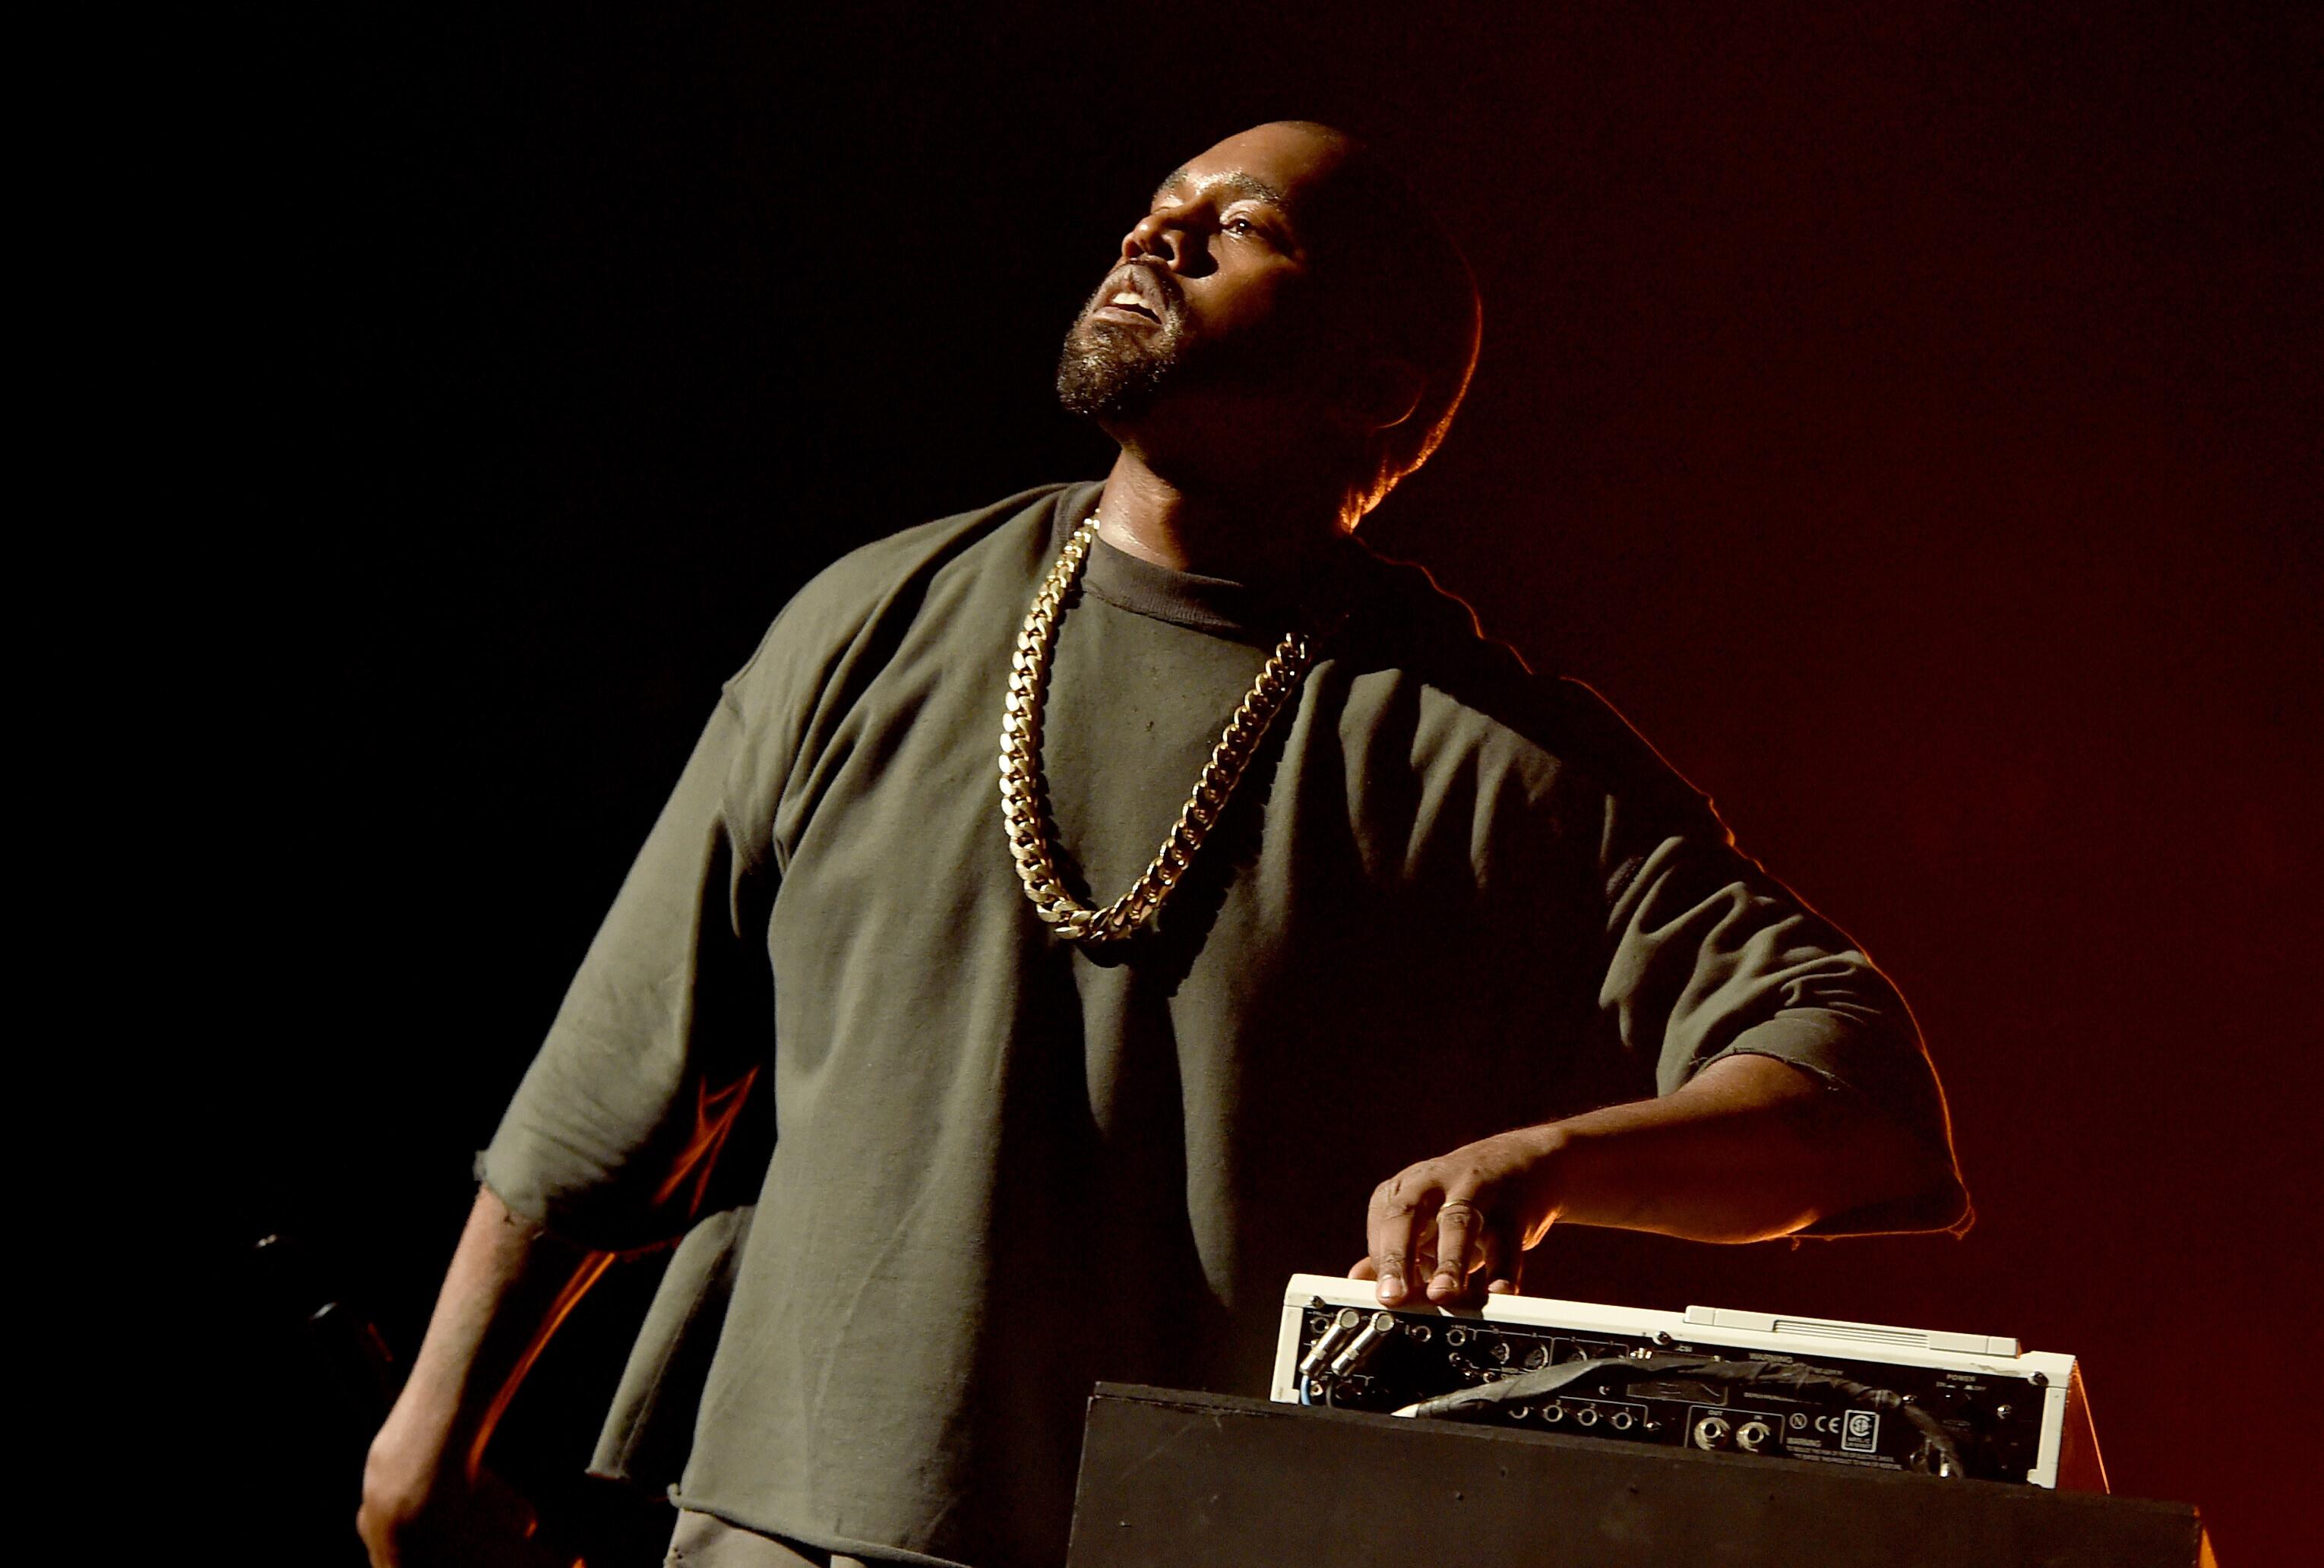 Kanye West releases new album 'Donda' after delay